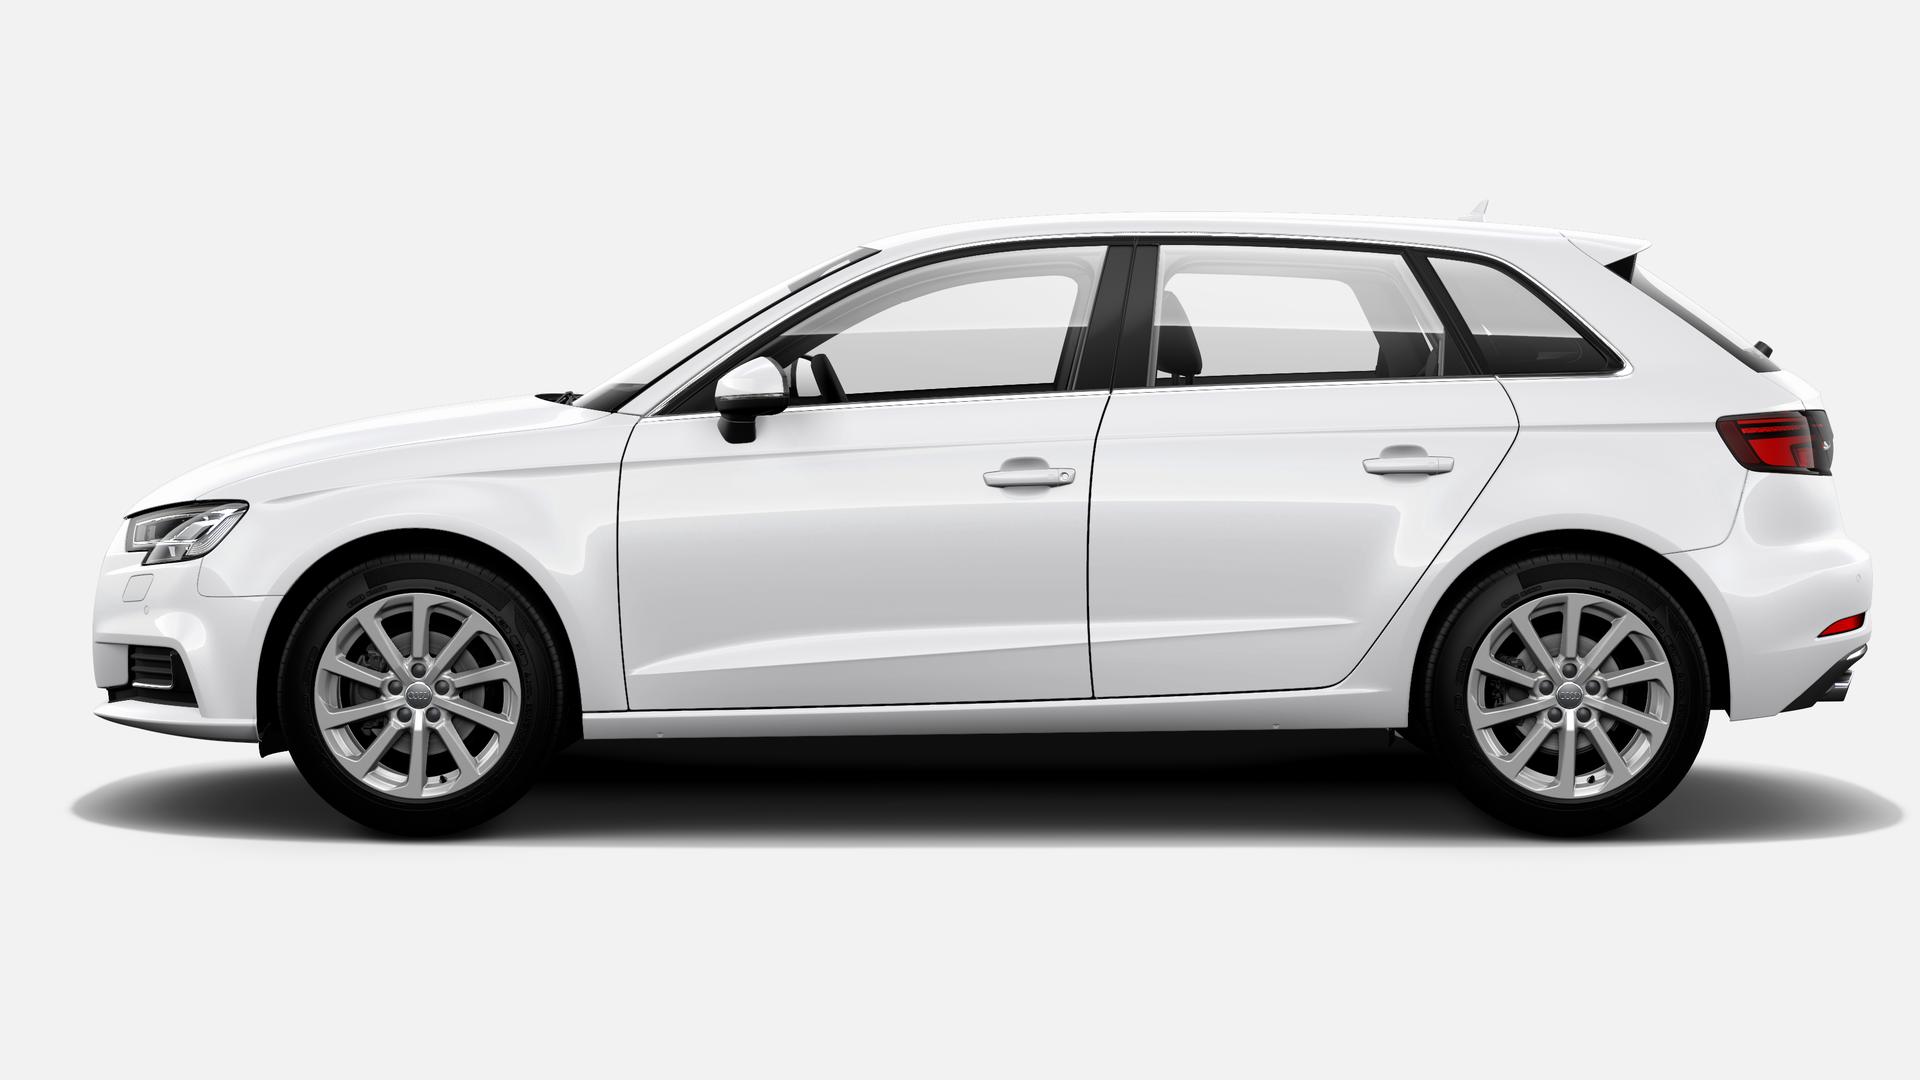 Vista Lateral izquierda de Audi A3 Sportback 1.6 TDI Design Edition 85 kW (116 CV)